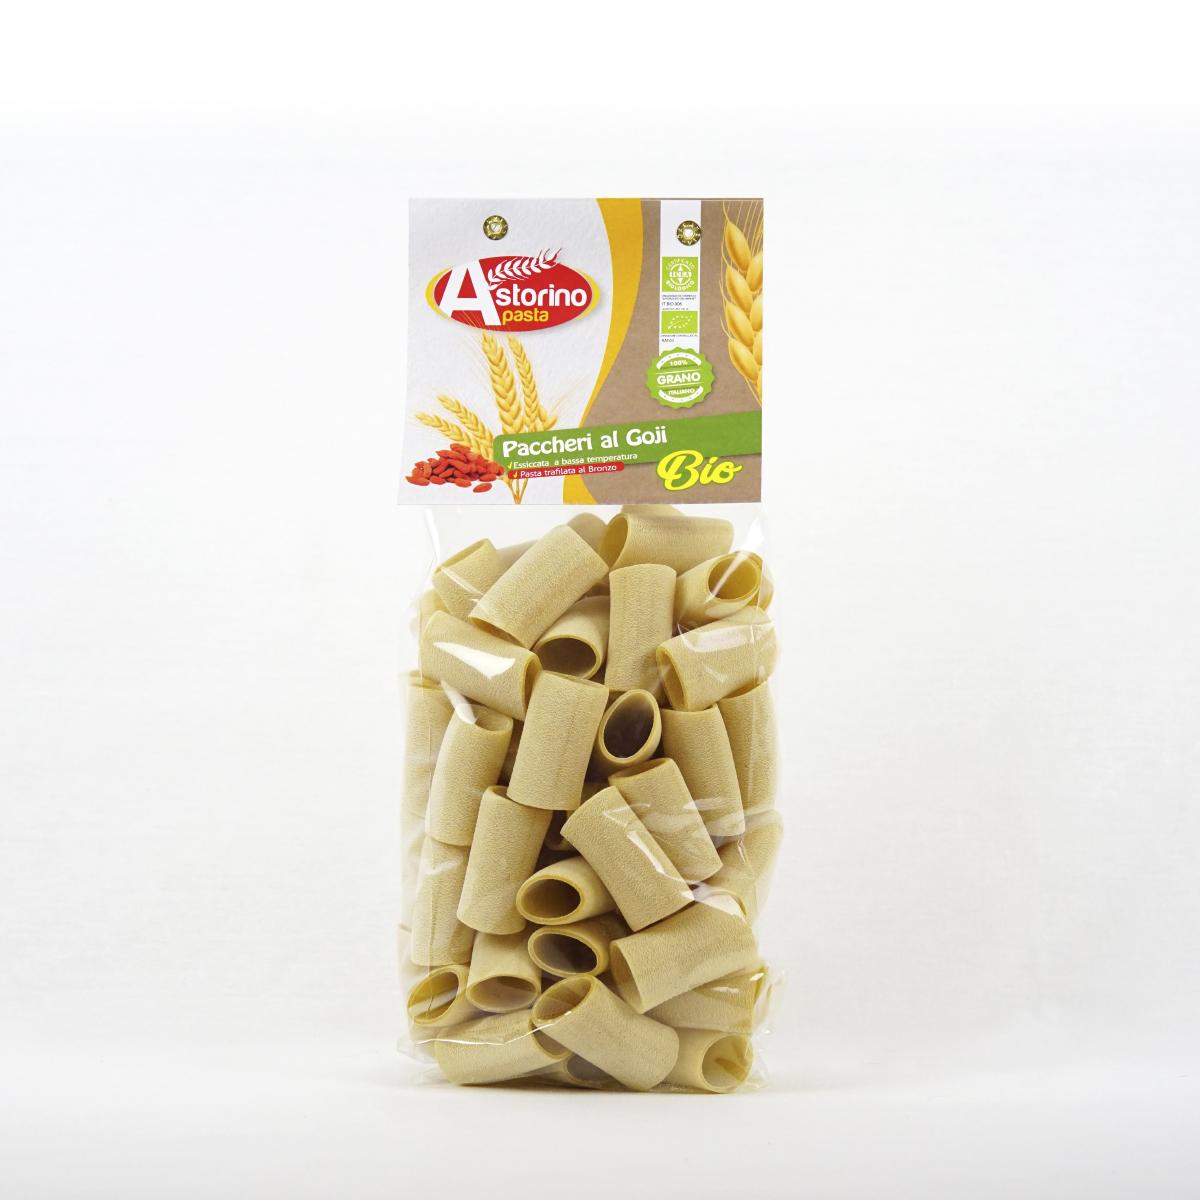 pasta_biologica_di_grano_duro_paccheri_bacche_goji_f